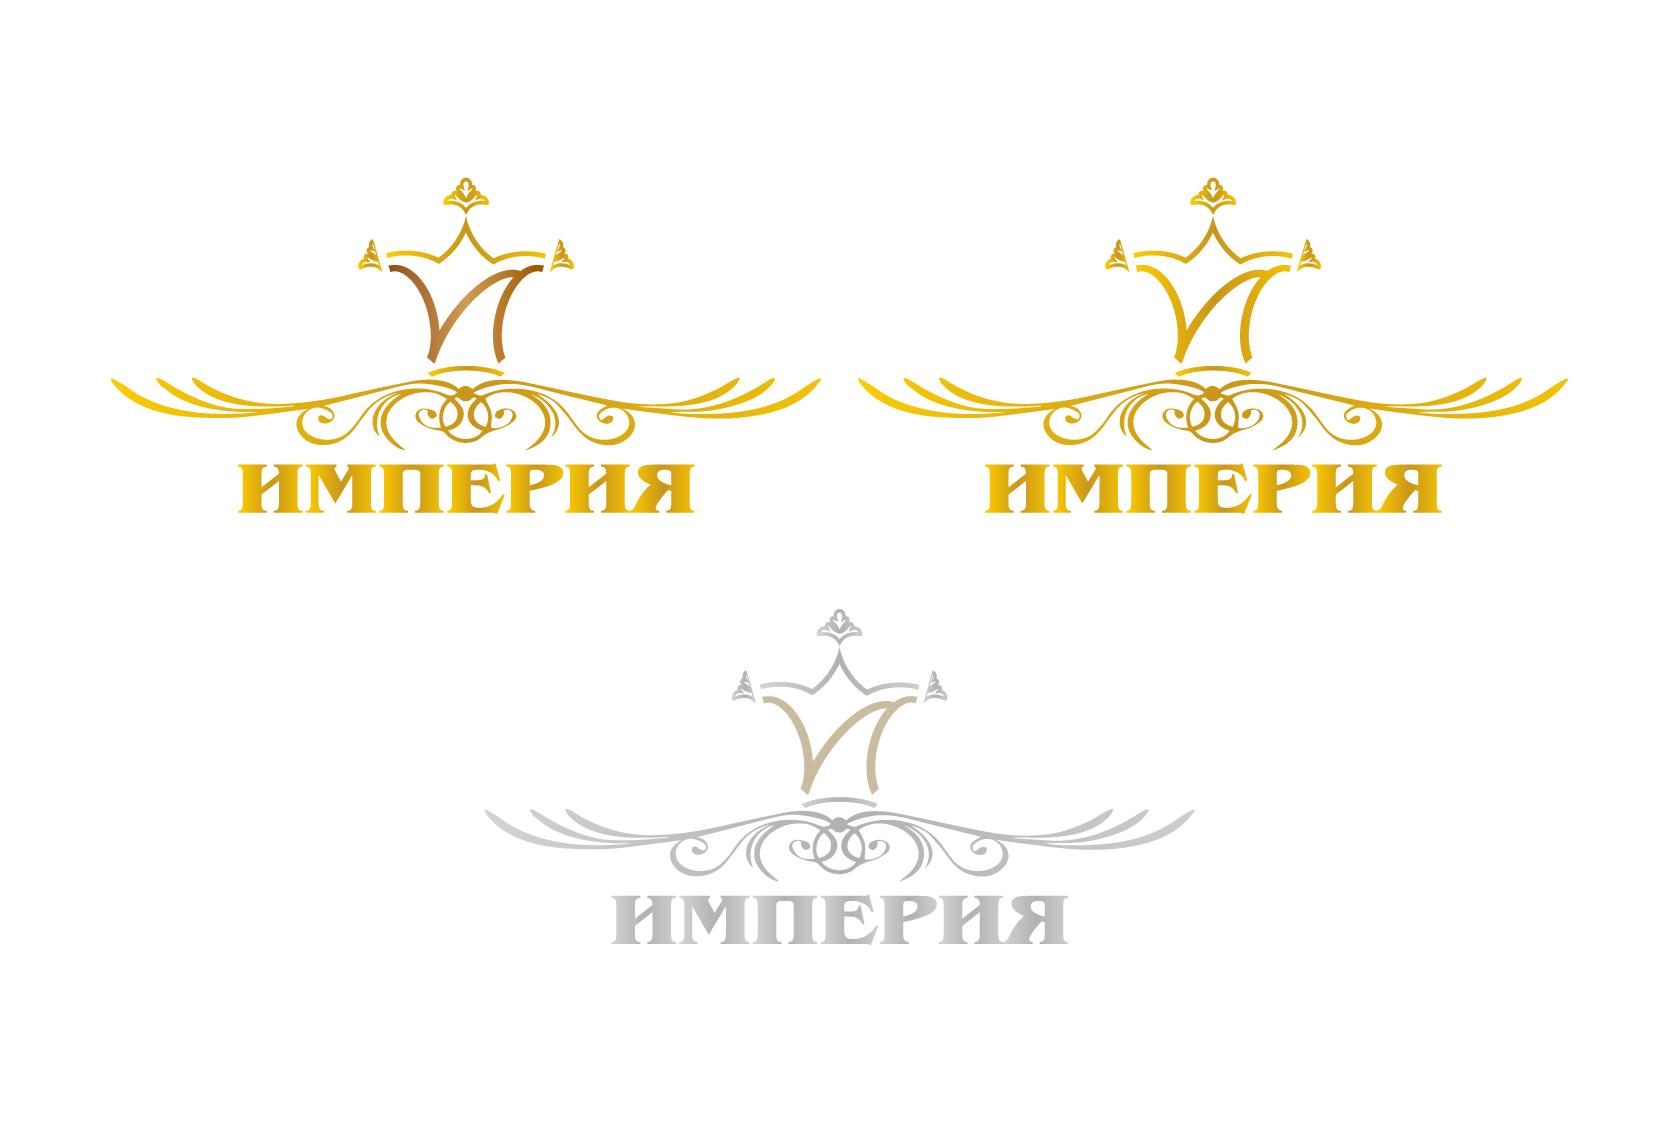 Разработать логотип для нового бренда фото f_26159e0bd5acd78a.jpg